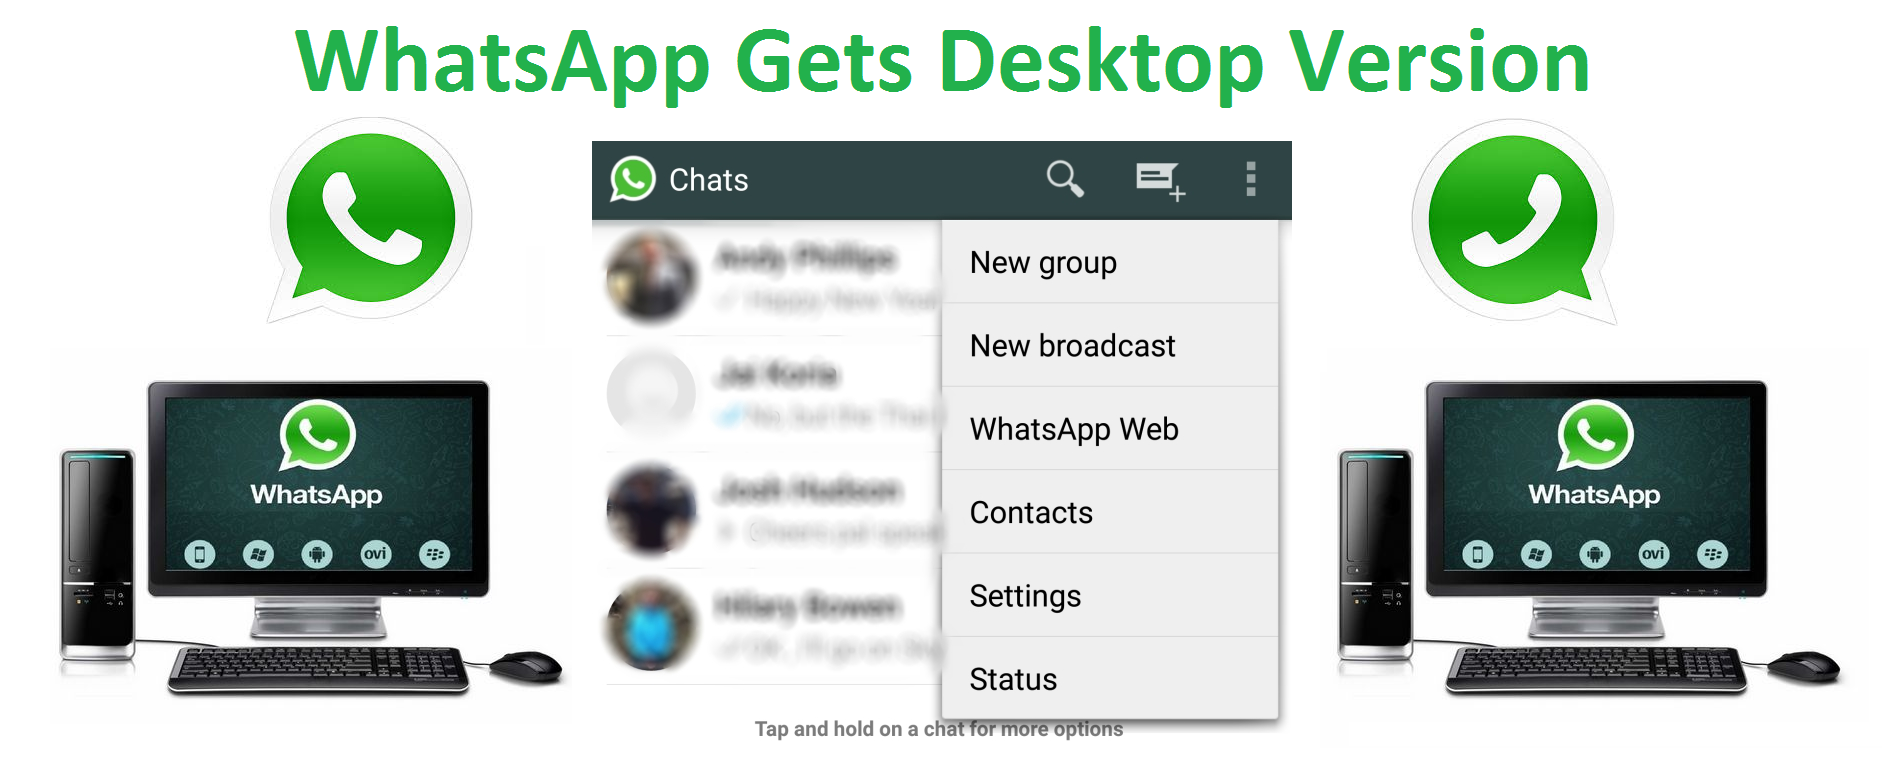 WhatsApp Gets Desktop Version